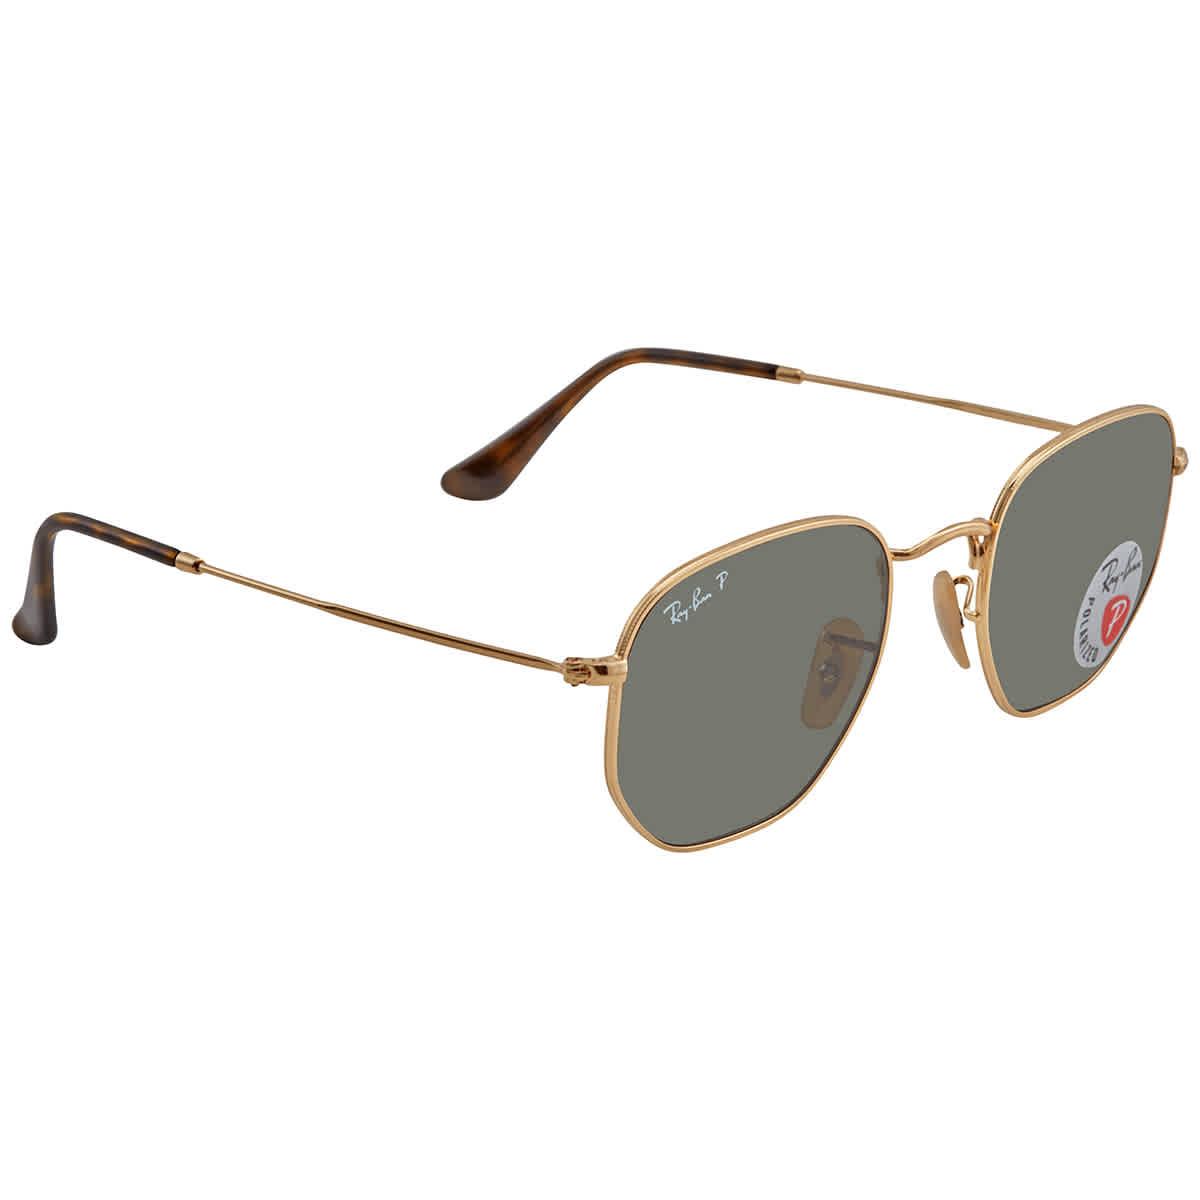 Ray Ban Polarized Unisex Green Hexagonal Sunglasses RB3548N 001/58 51